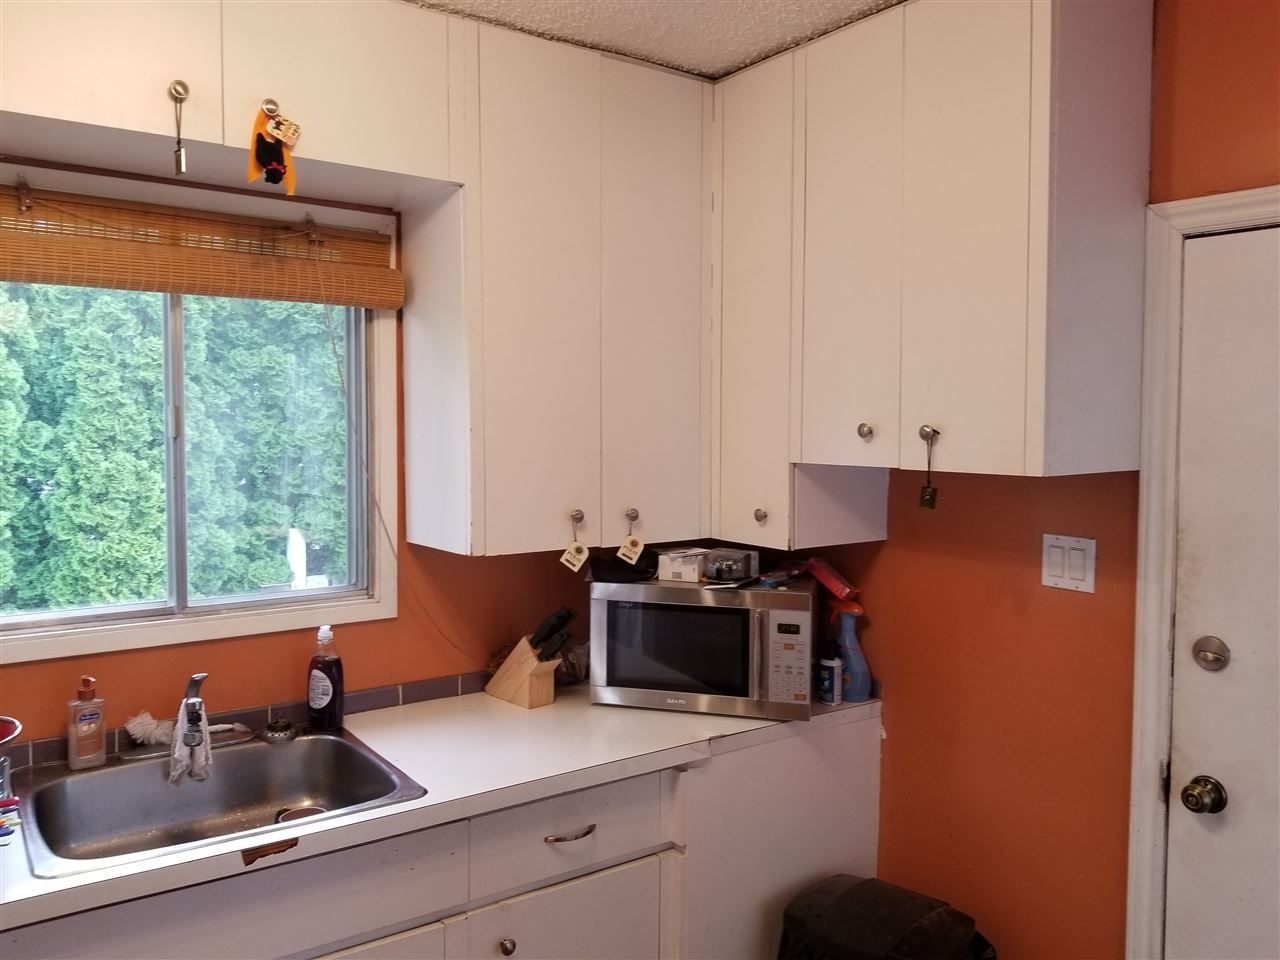 Photo 6: Photos: 9242 152 Street in Edmonton: Zone 22 House for sale : MLS®# E4158939